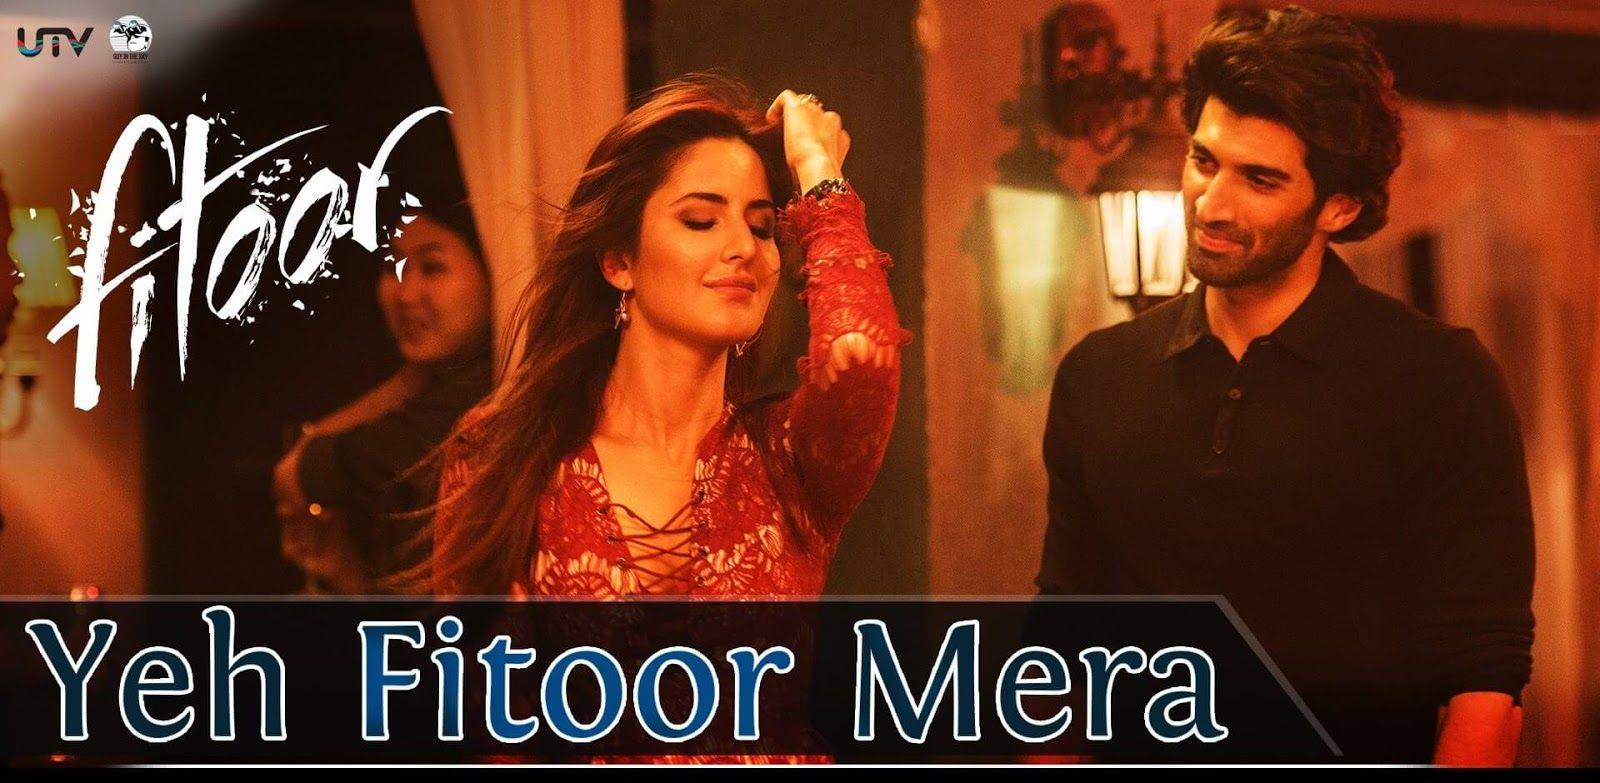 Yeh Fitoor Mera Arijit Singh, Katrina Kaif, Aditya Roy